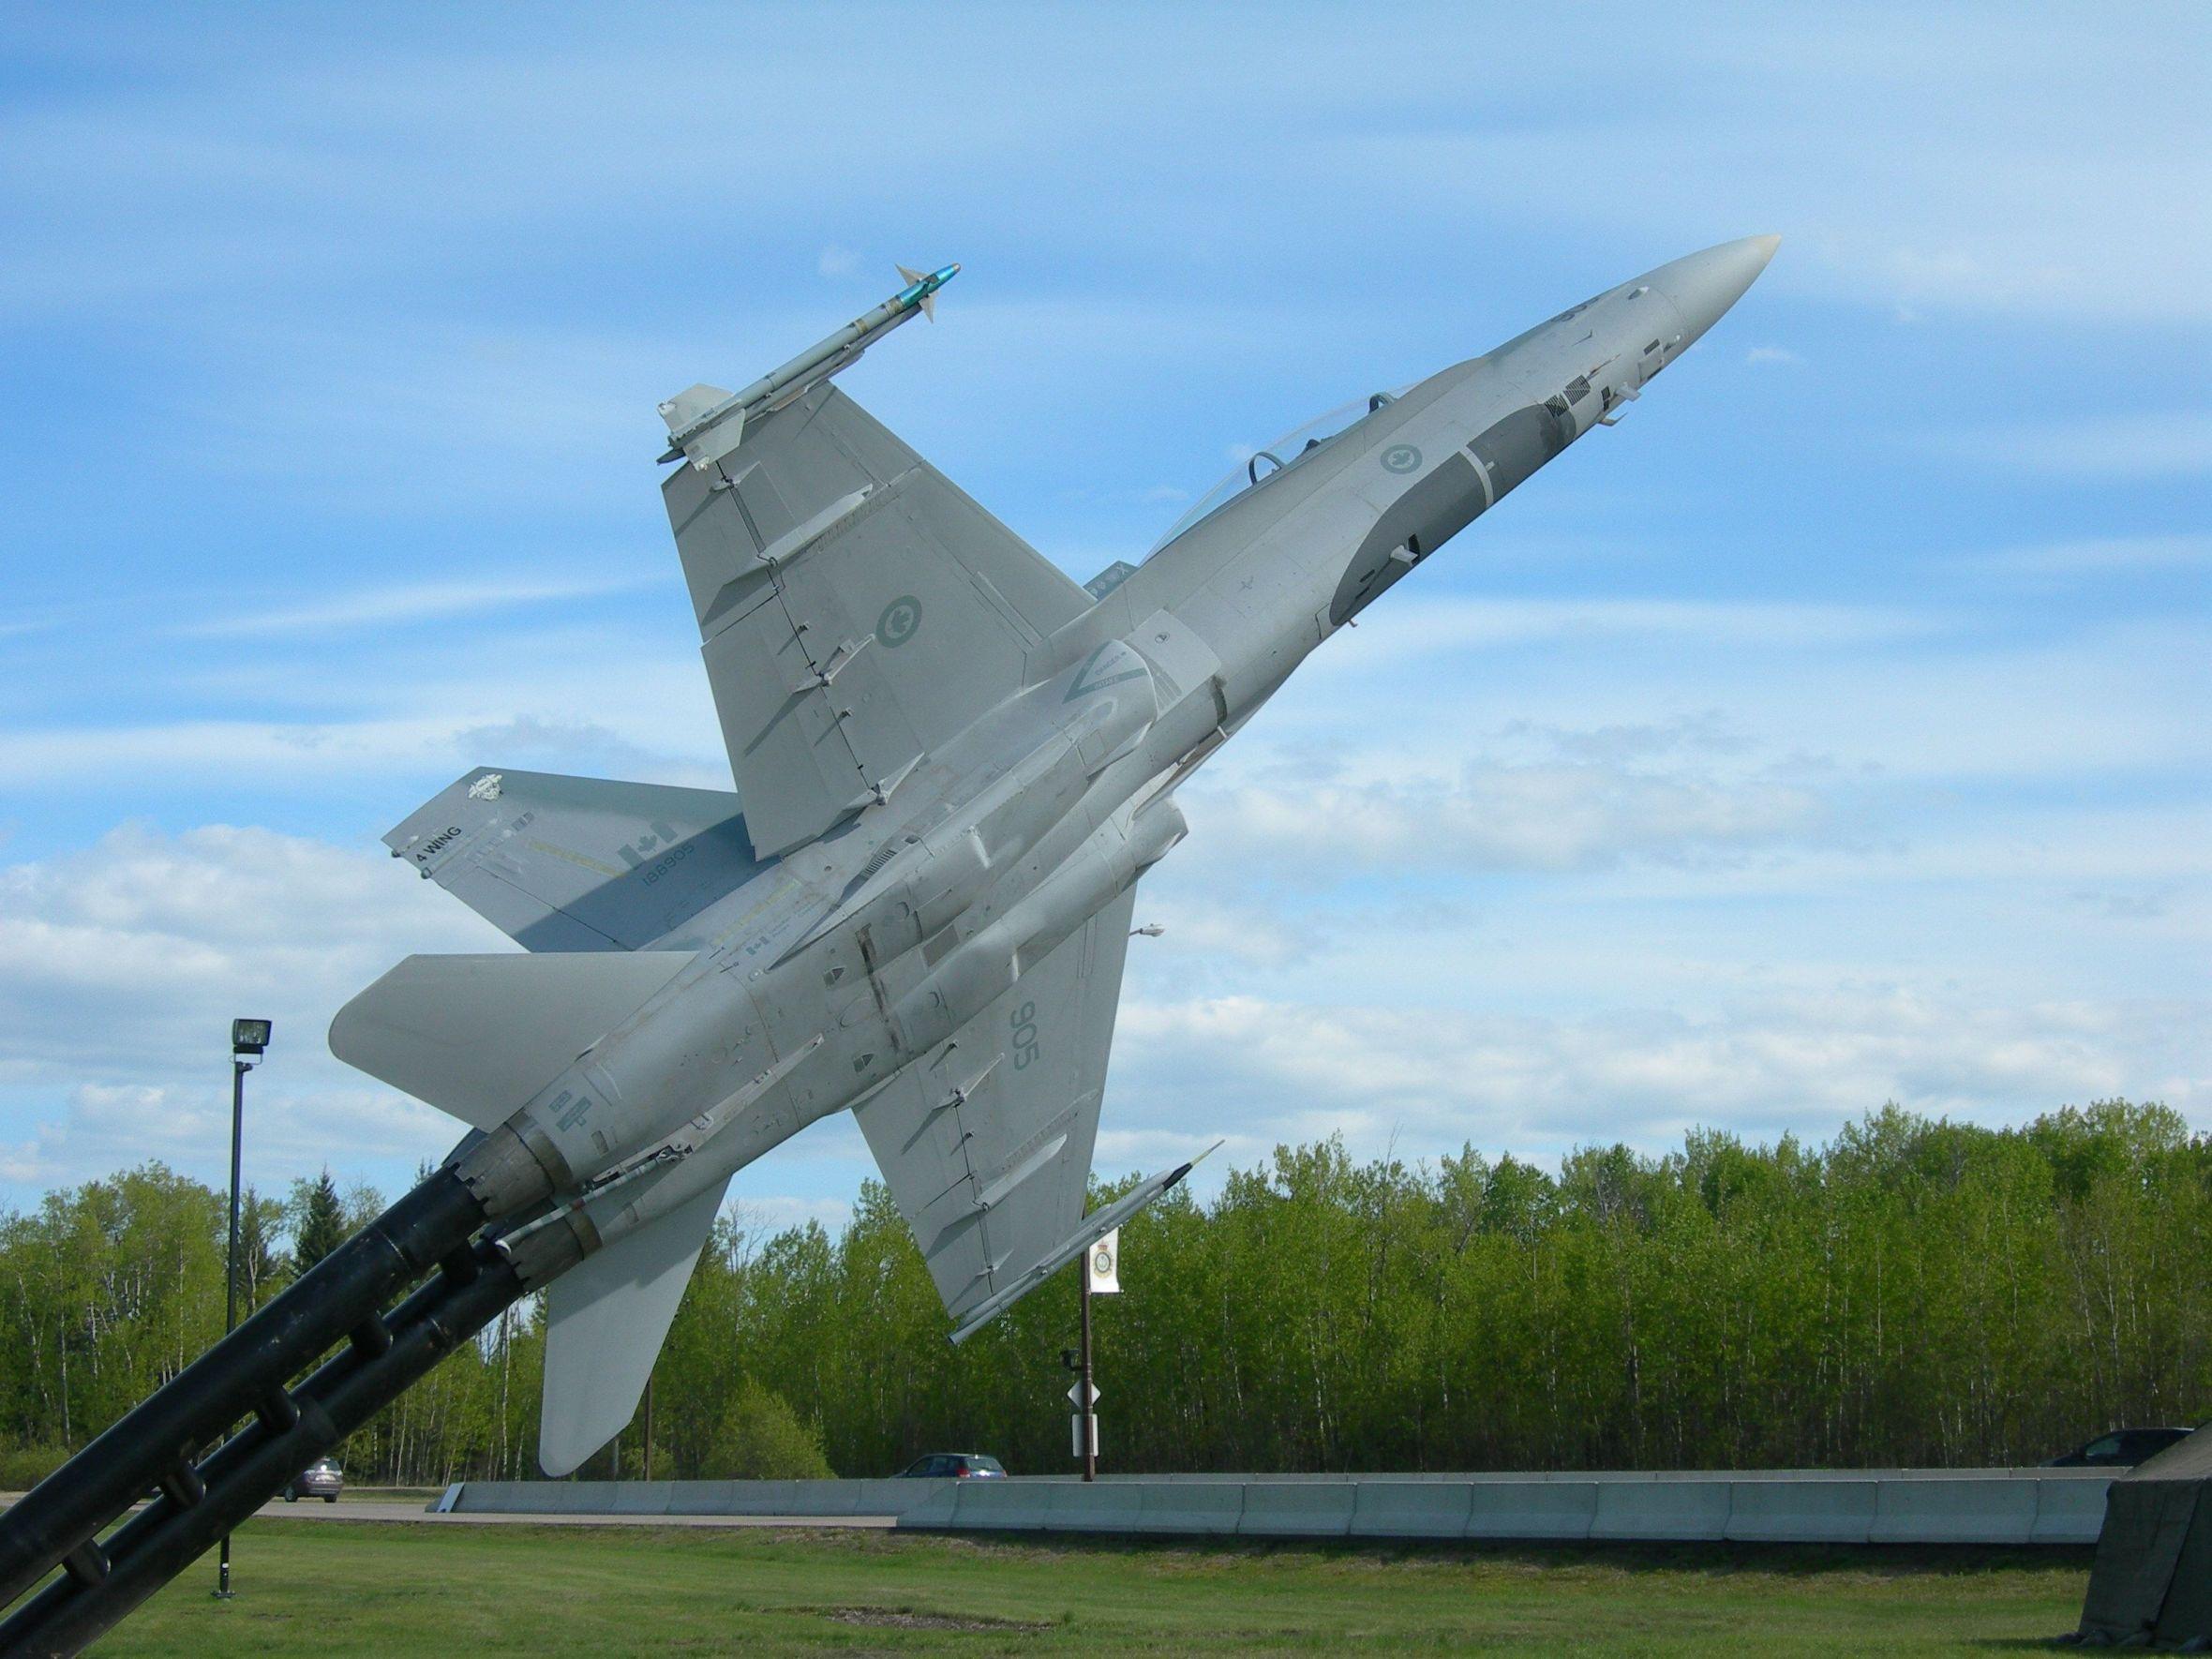 Stèles Base aérienne Cold Lake-Alberta-Canada 14060504284317629412292946